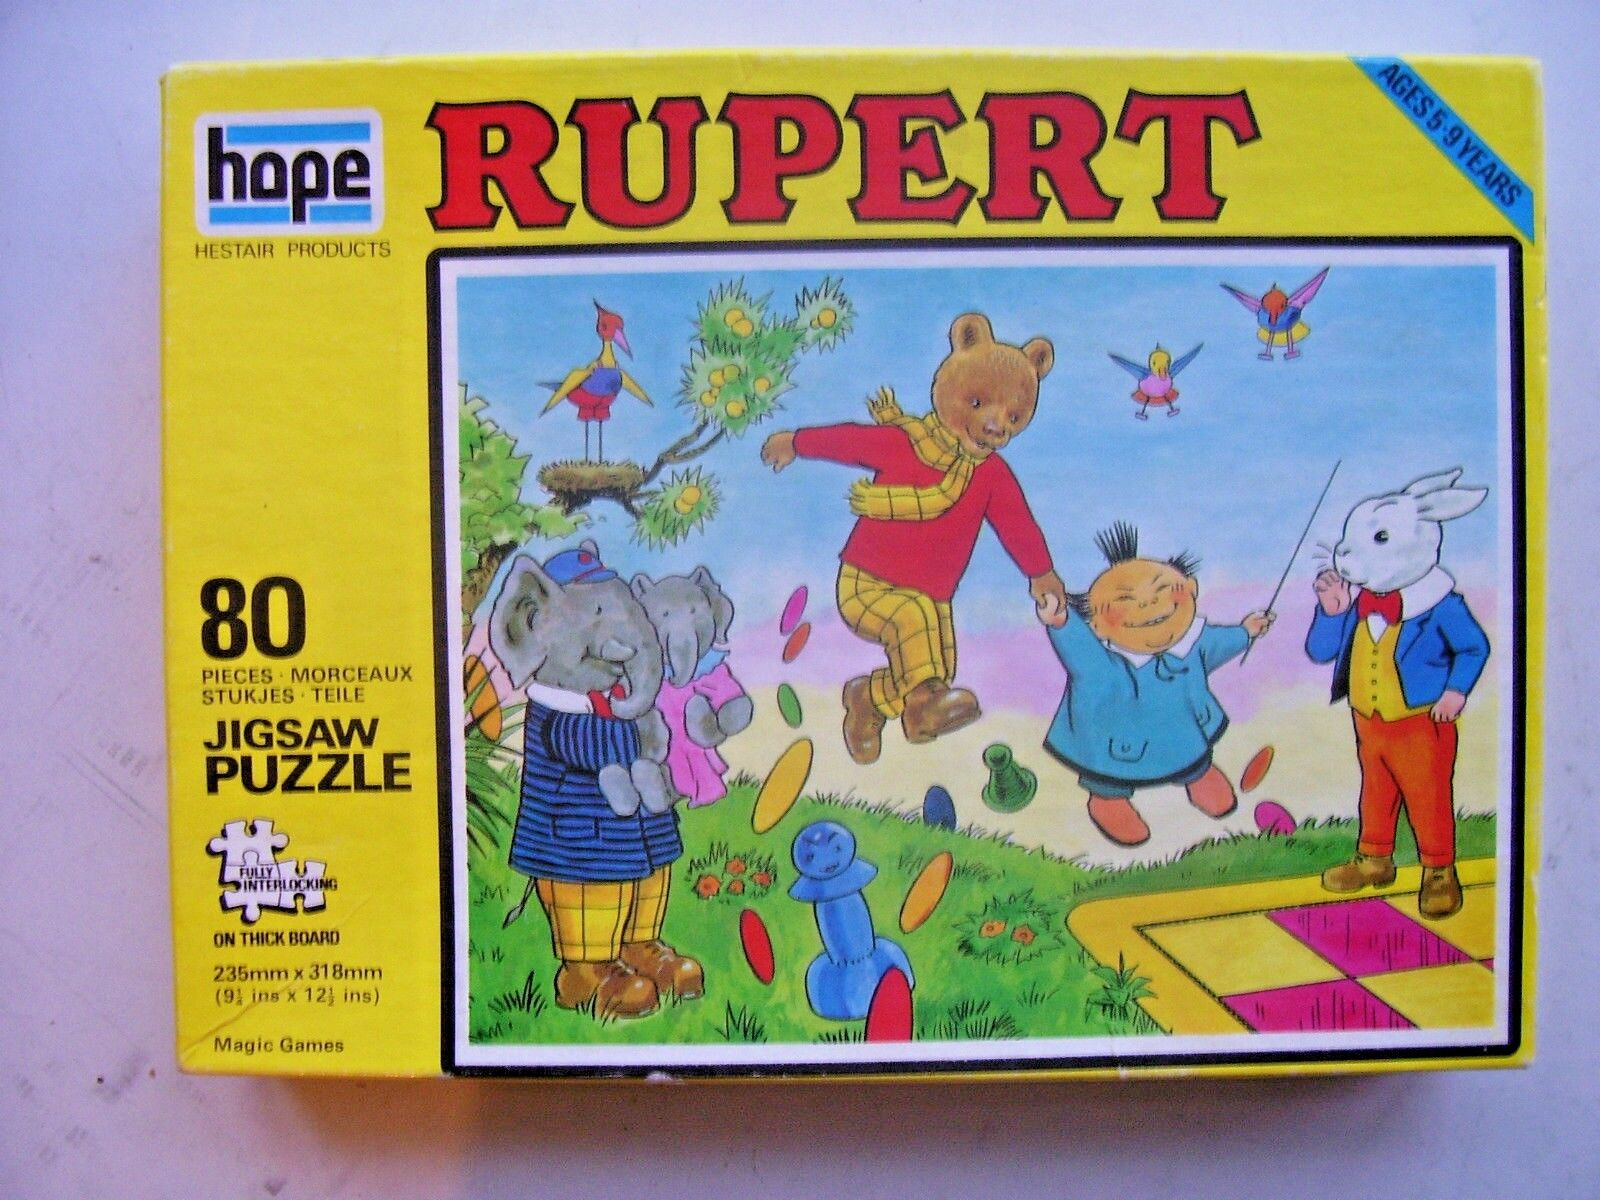 Vintage Rupert 80 Piece Jigsaw by Hope (1973) Magic Games